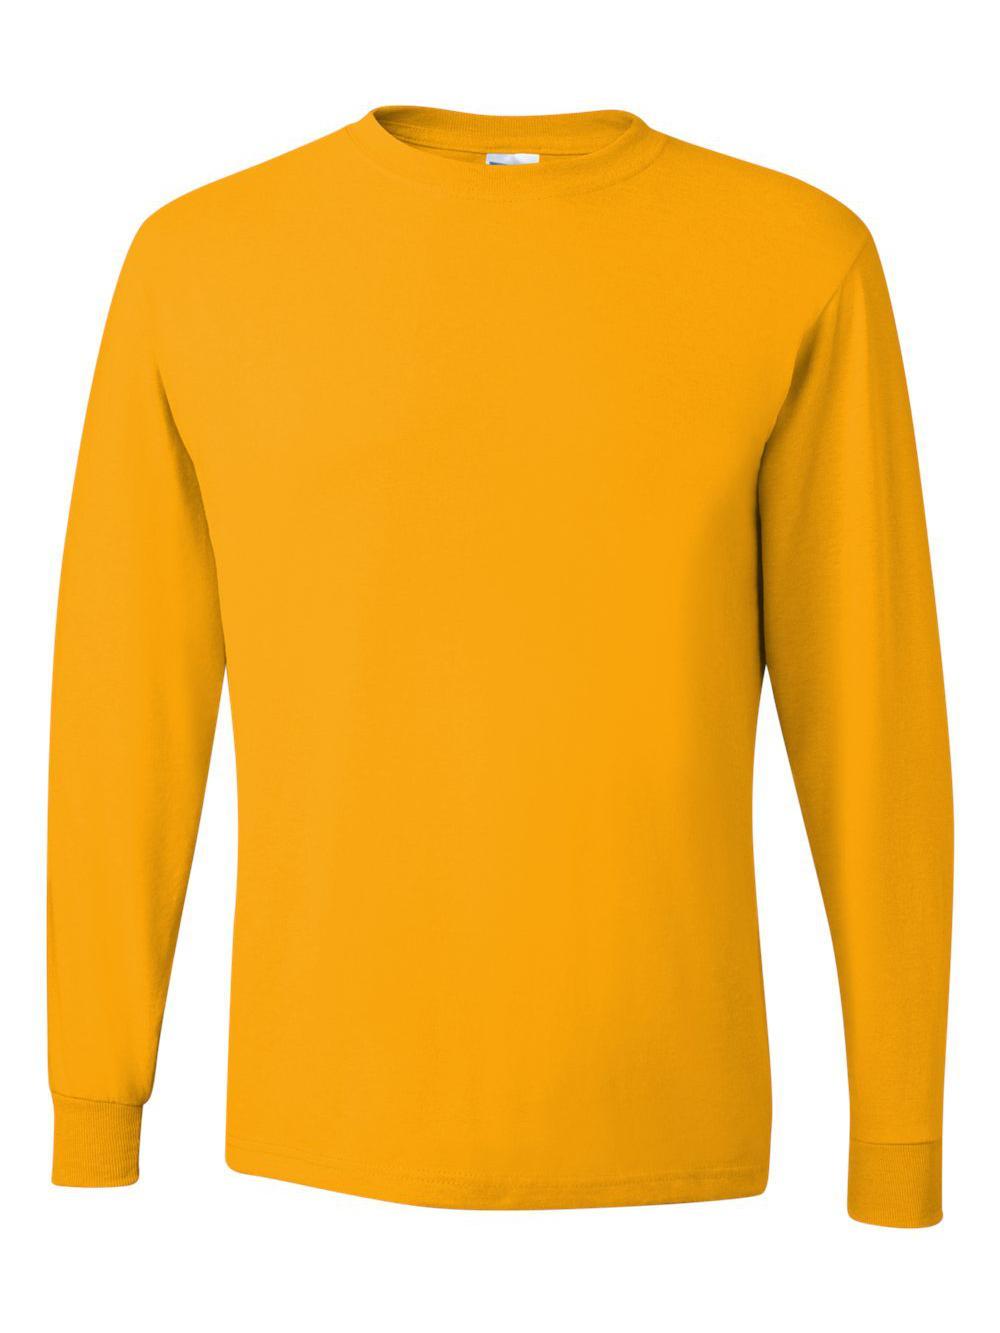 Jerzees-Dri-Power-Long-Sleeve-50-50-T-Shirt-29LSR thumbnail 39